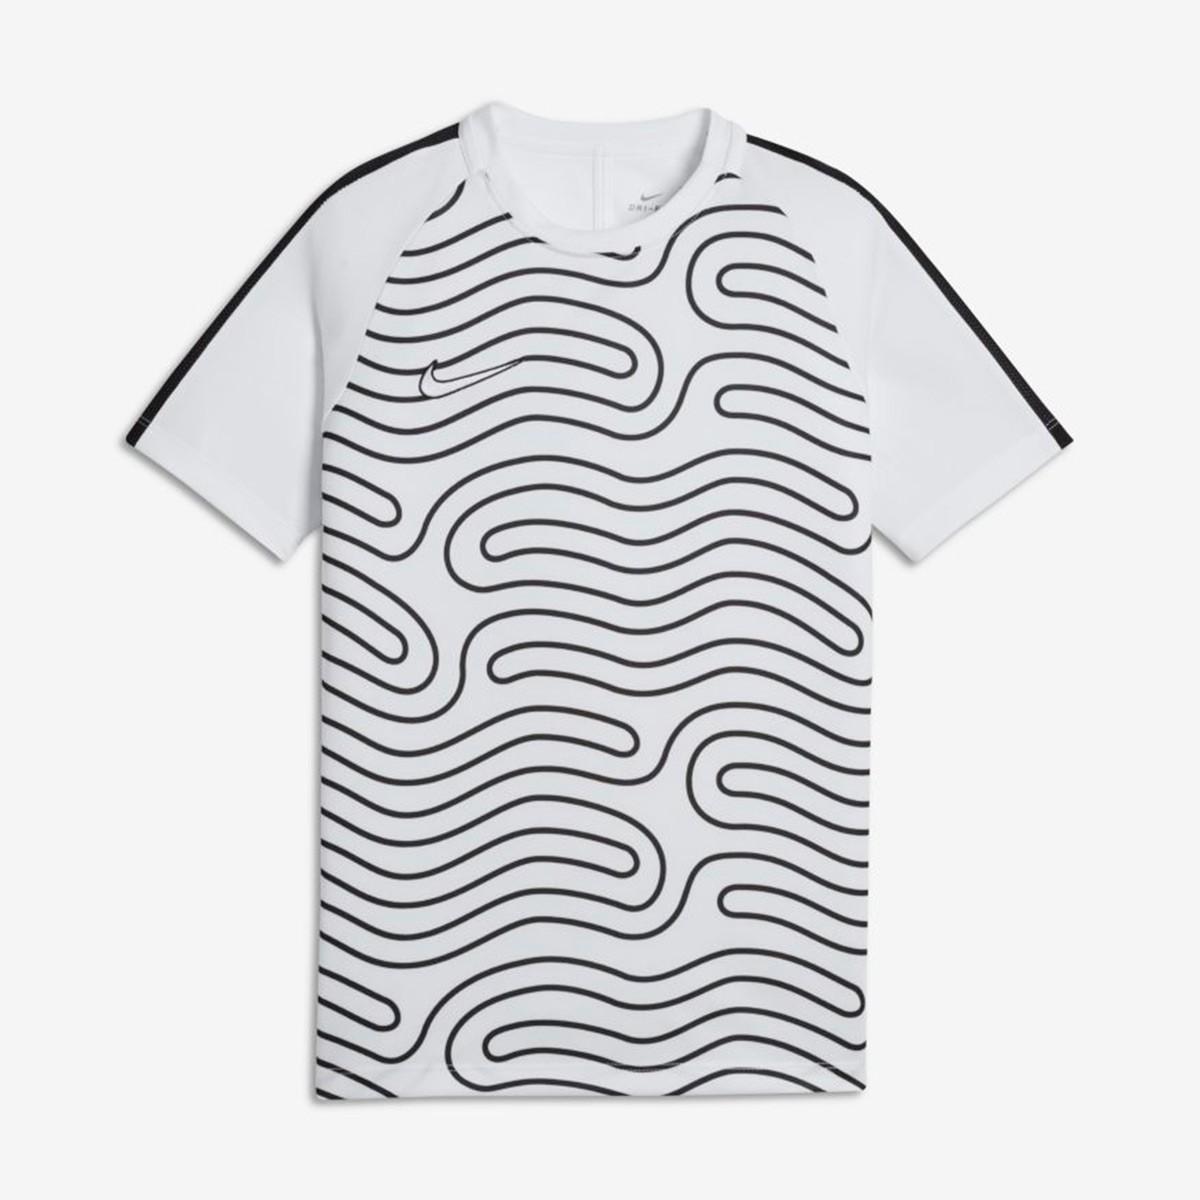 57b7128ab0 Camiseta Nike Dry Academy TopSS GX2 Niño White-Black - Soloporteros es  ahora Fútbol Emotion